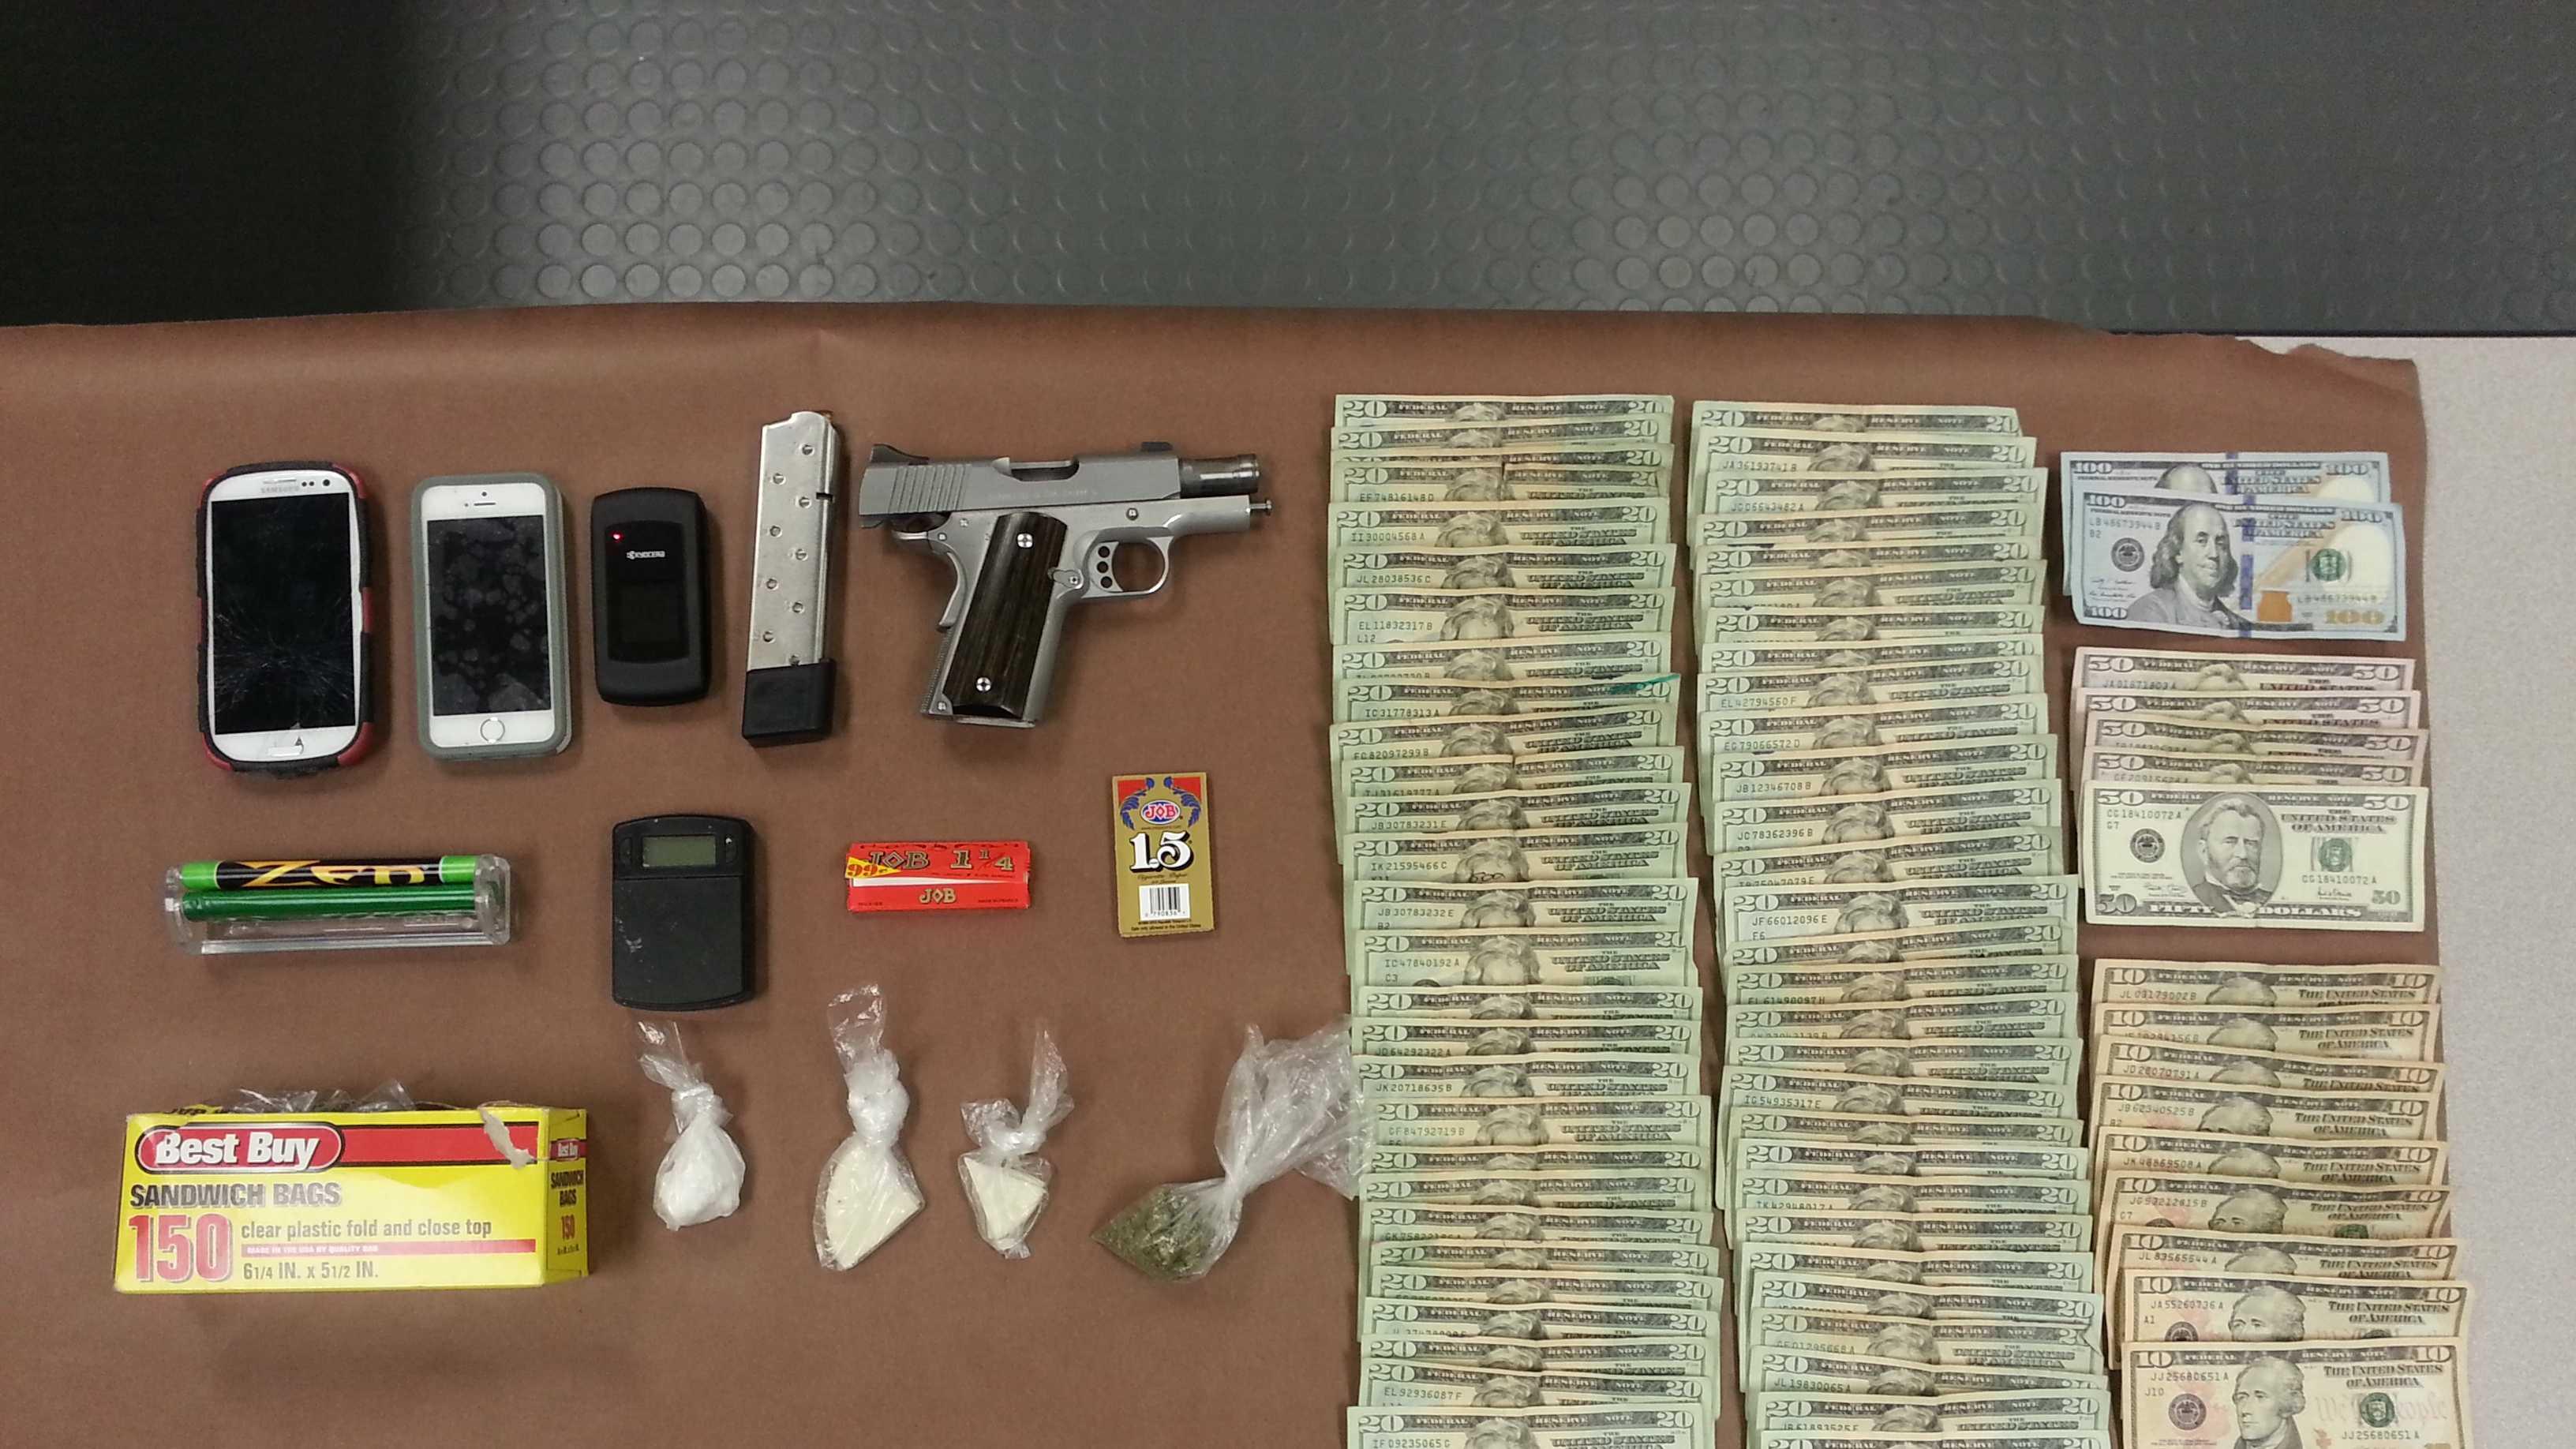 Cocoa burglary arrest